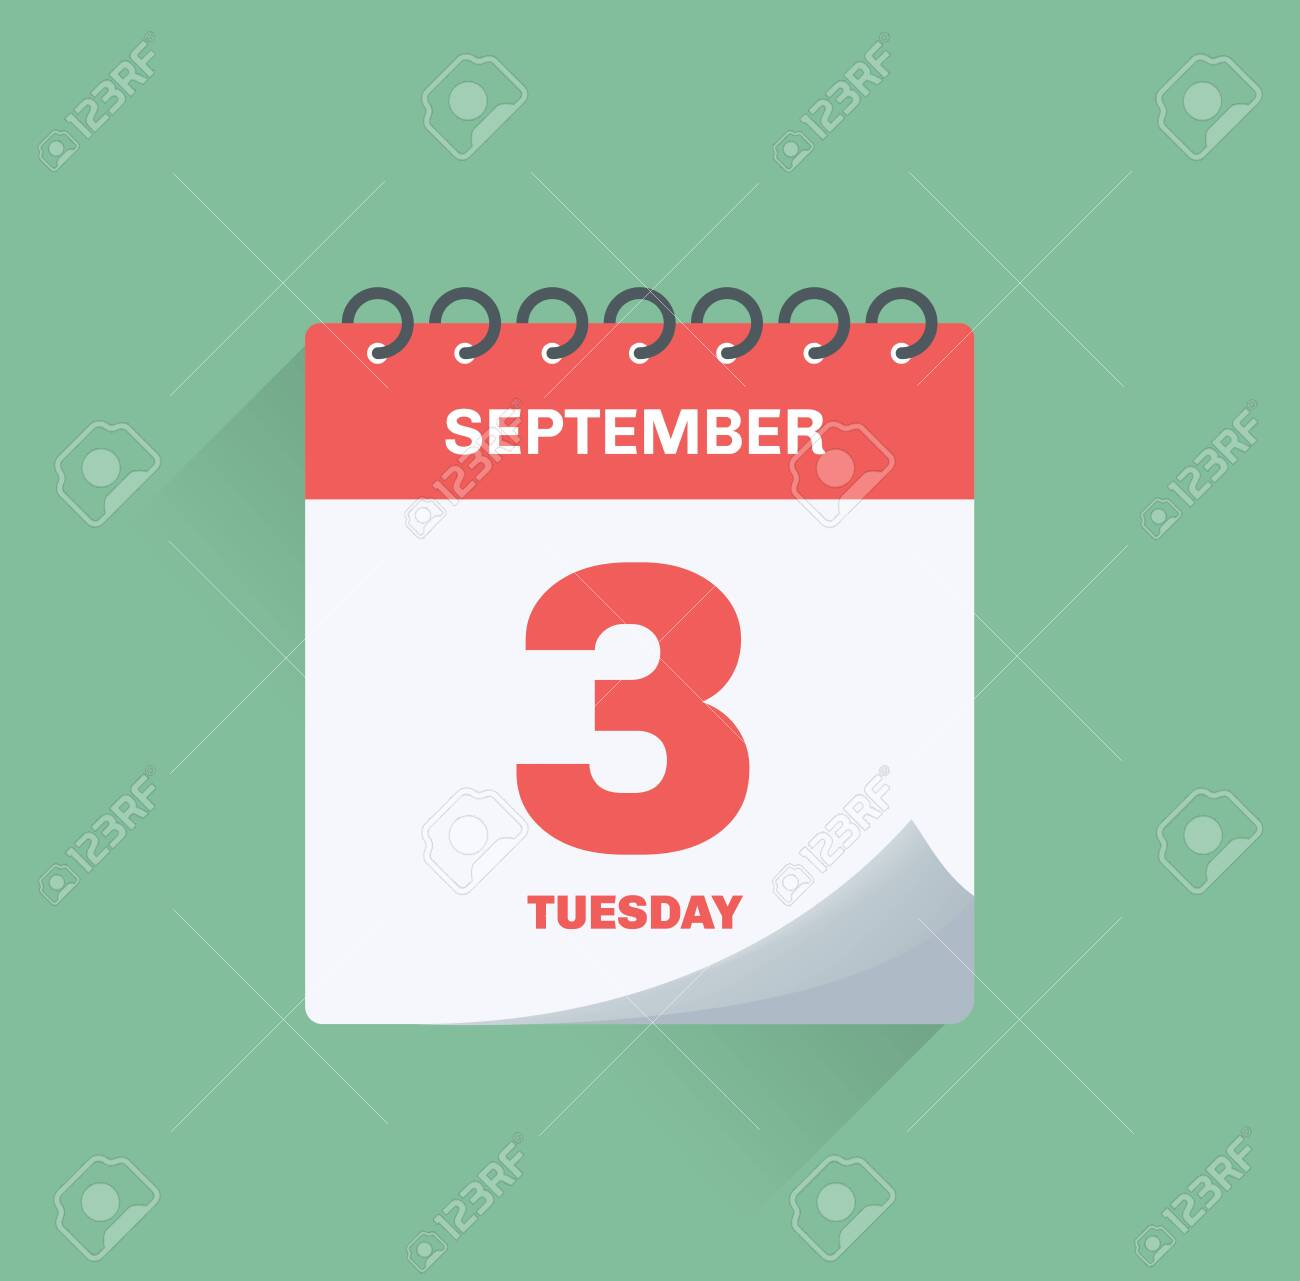 Vector illustration. Day calendar with date September 3. - 128732230